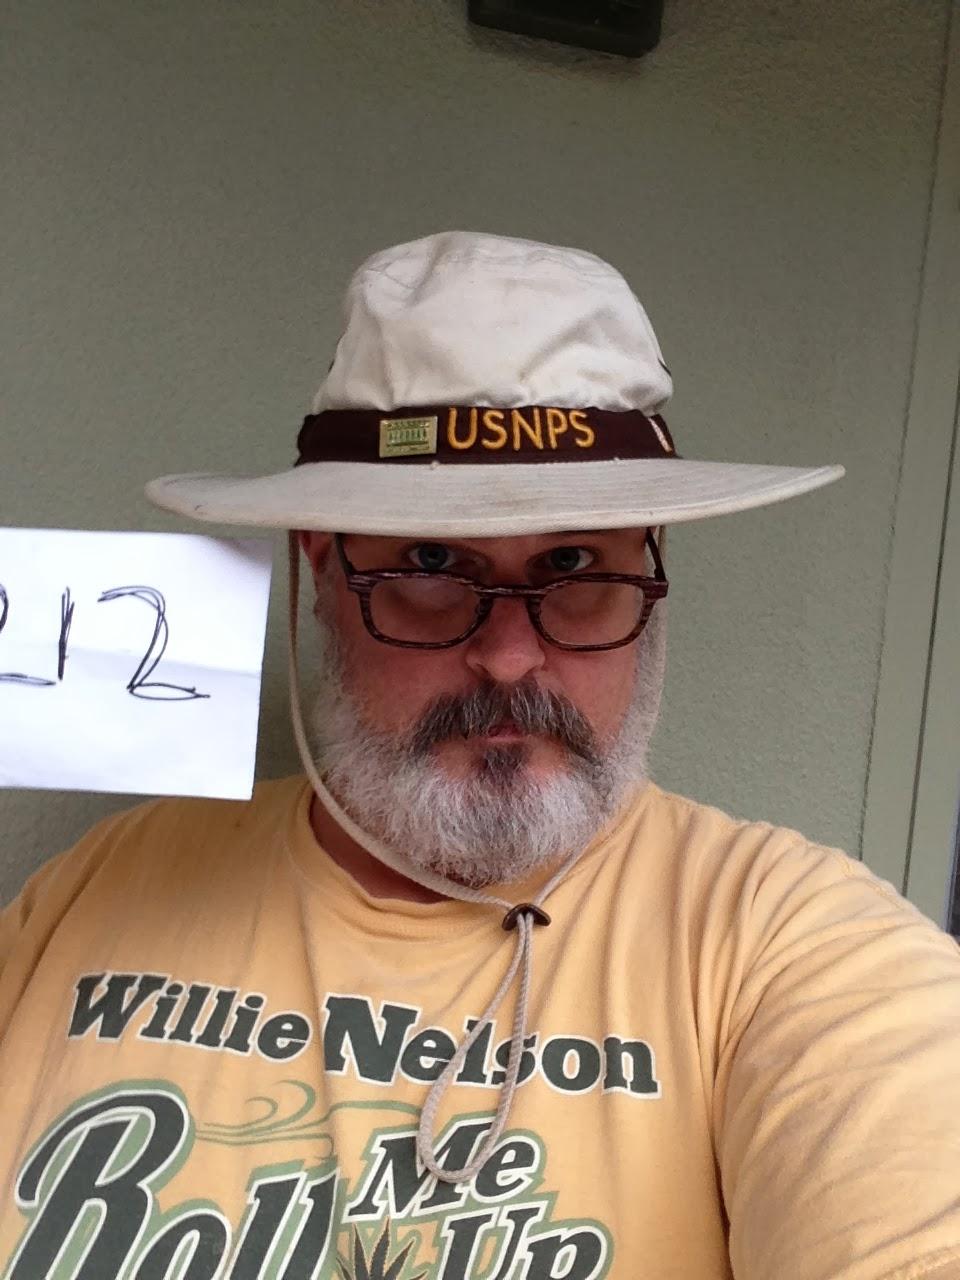 b5a53eccaa486 Day 212   Hat 212  Khaki-colored